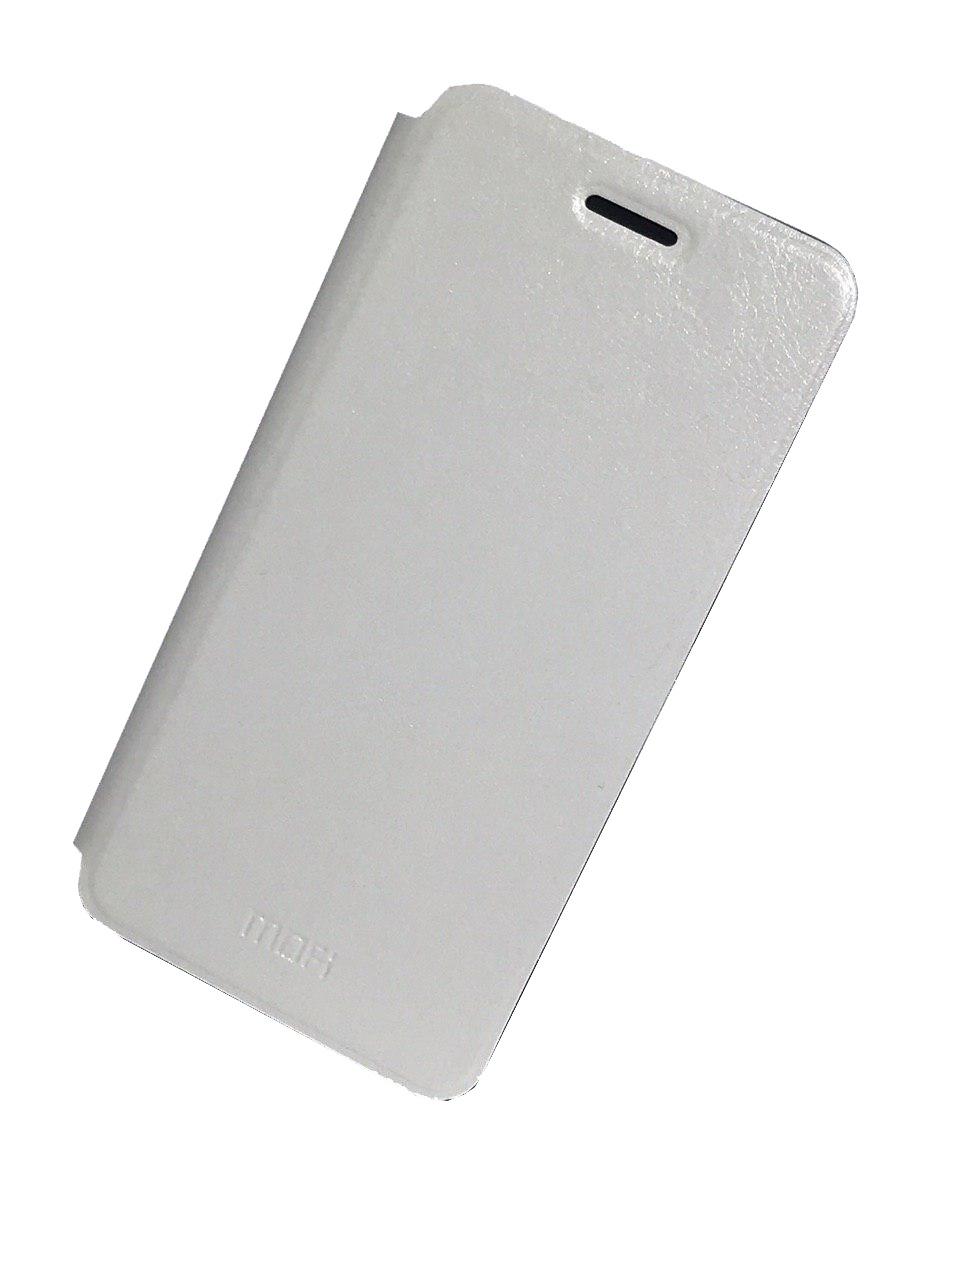 Чехол для Xiaomi Redmi 4A Книжка Xiaomi Redmi 4A White leather case colorful flip cover for xiaomi redmi 4a white